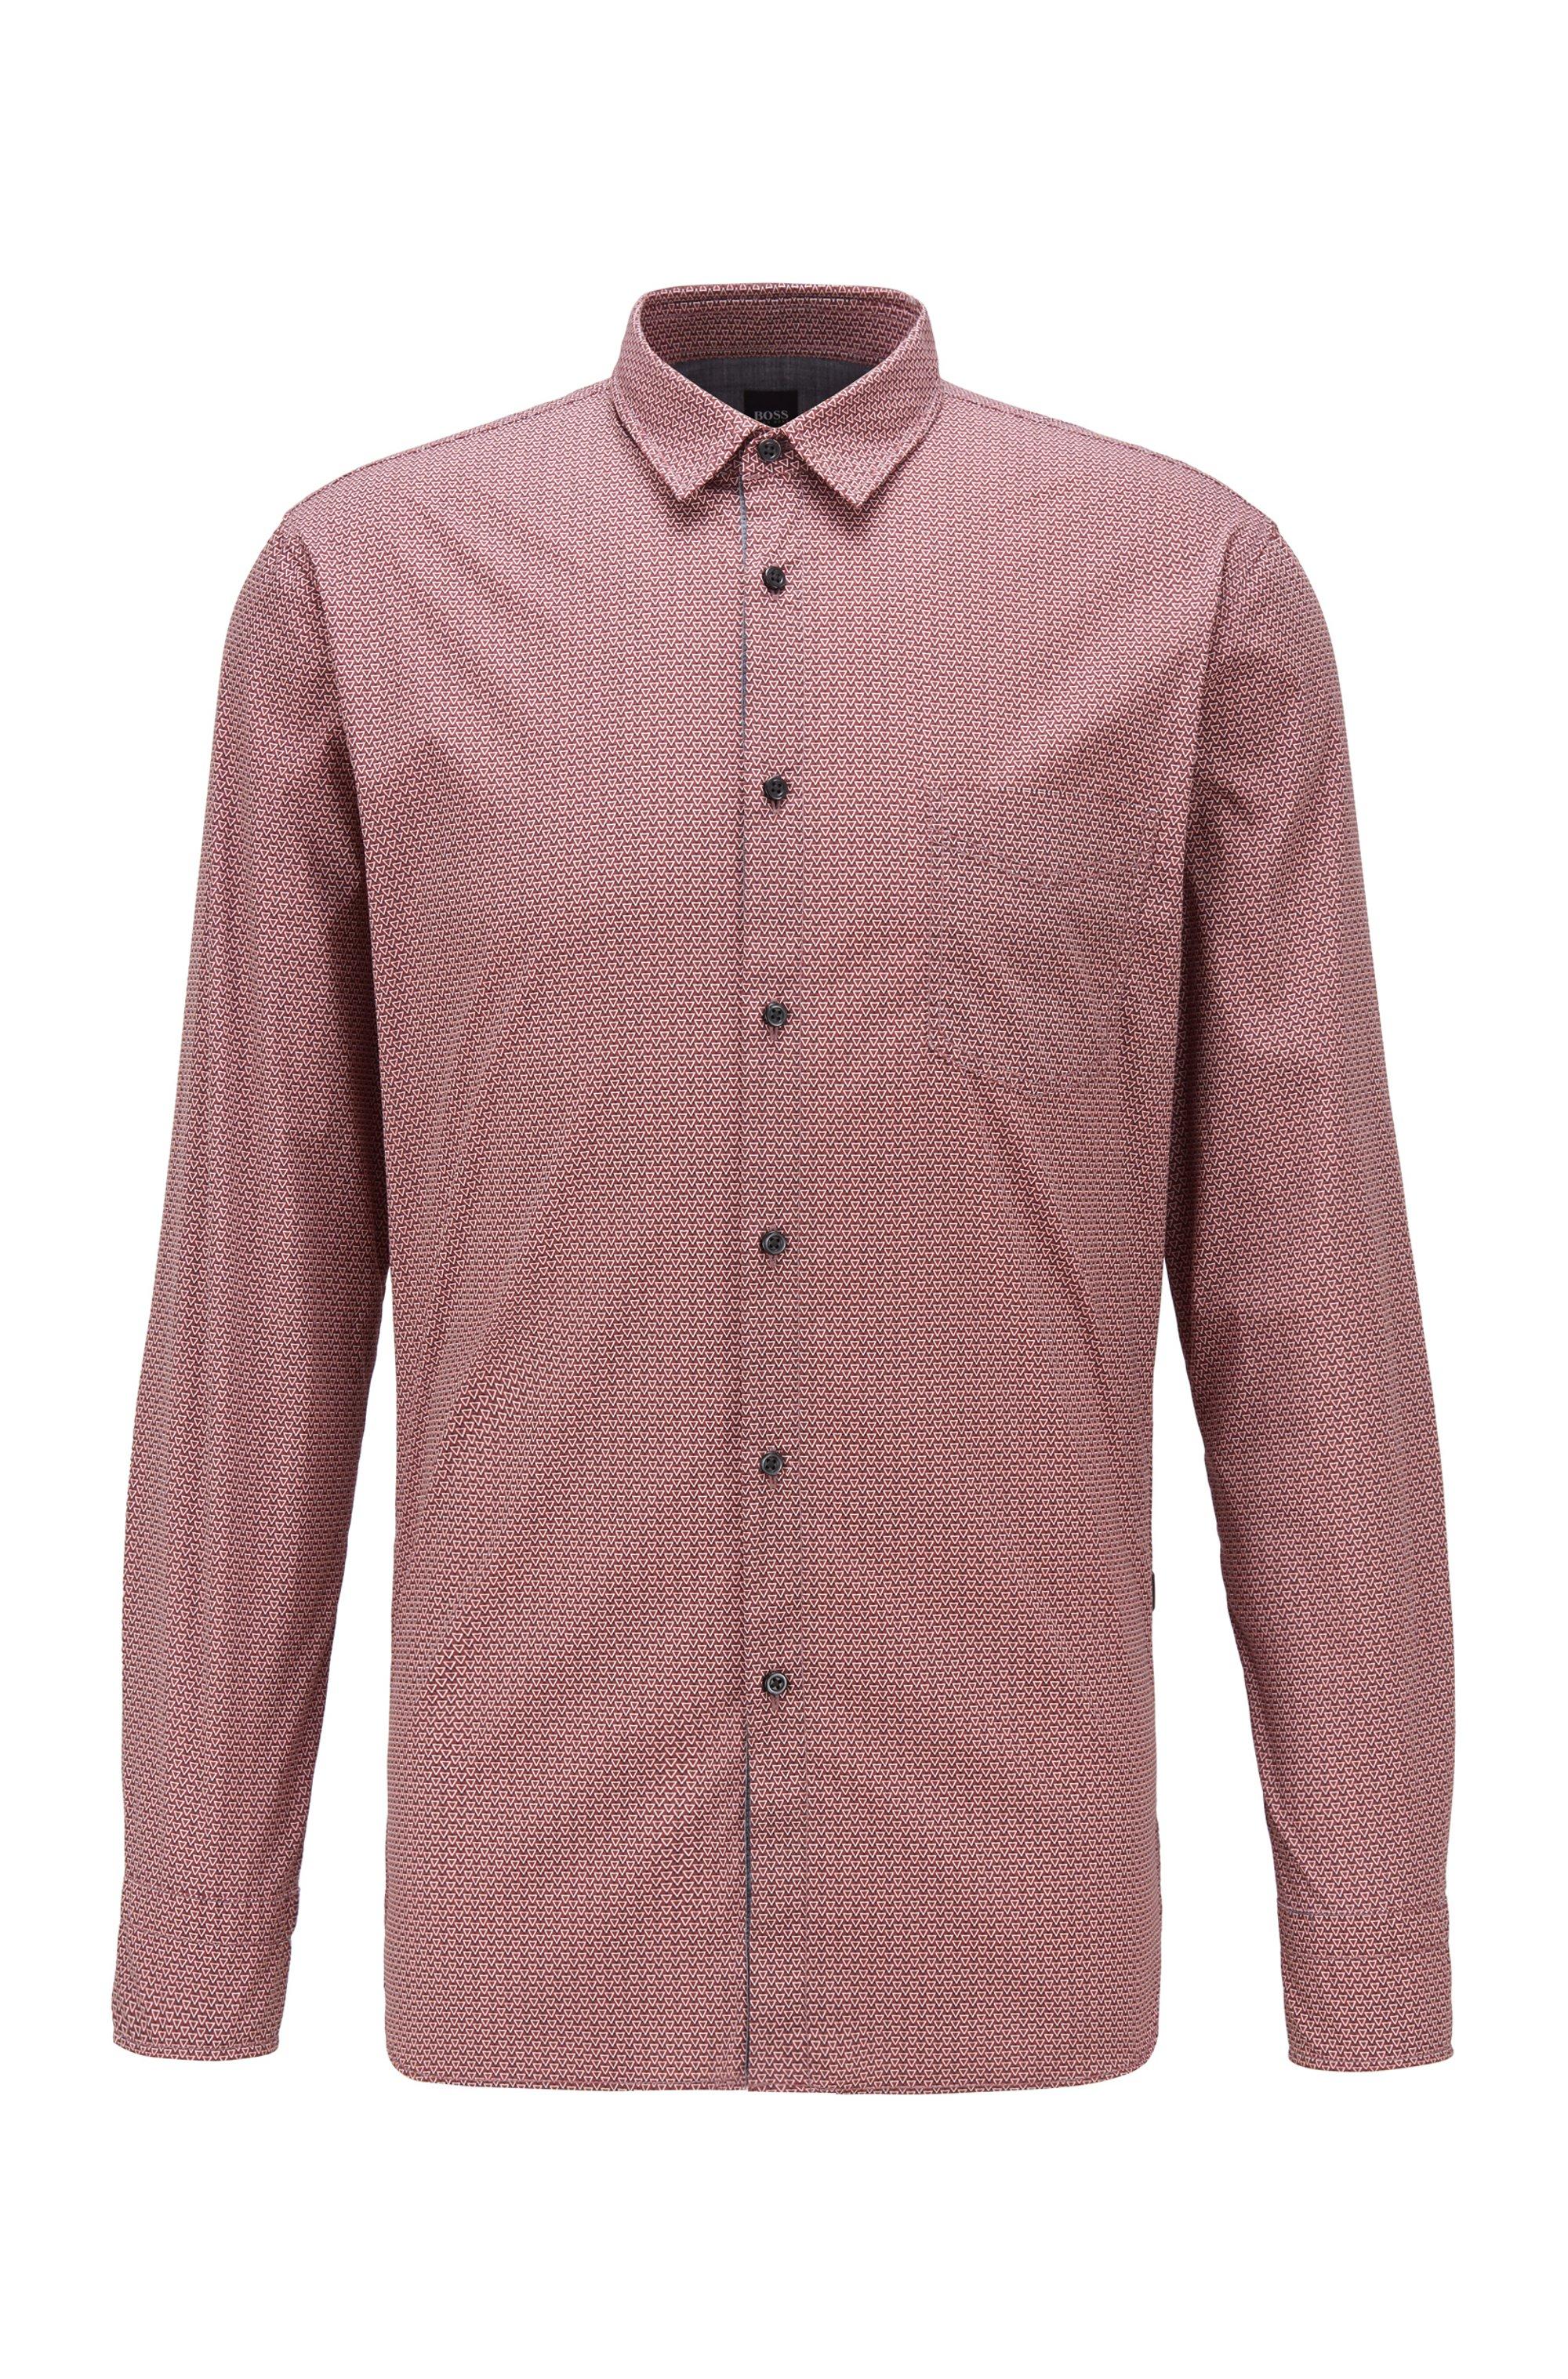 Gemustertes Slim-Fit Hemd aus Stretch-Popeline, Dunkelrot